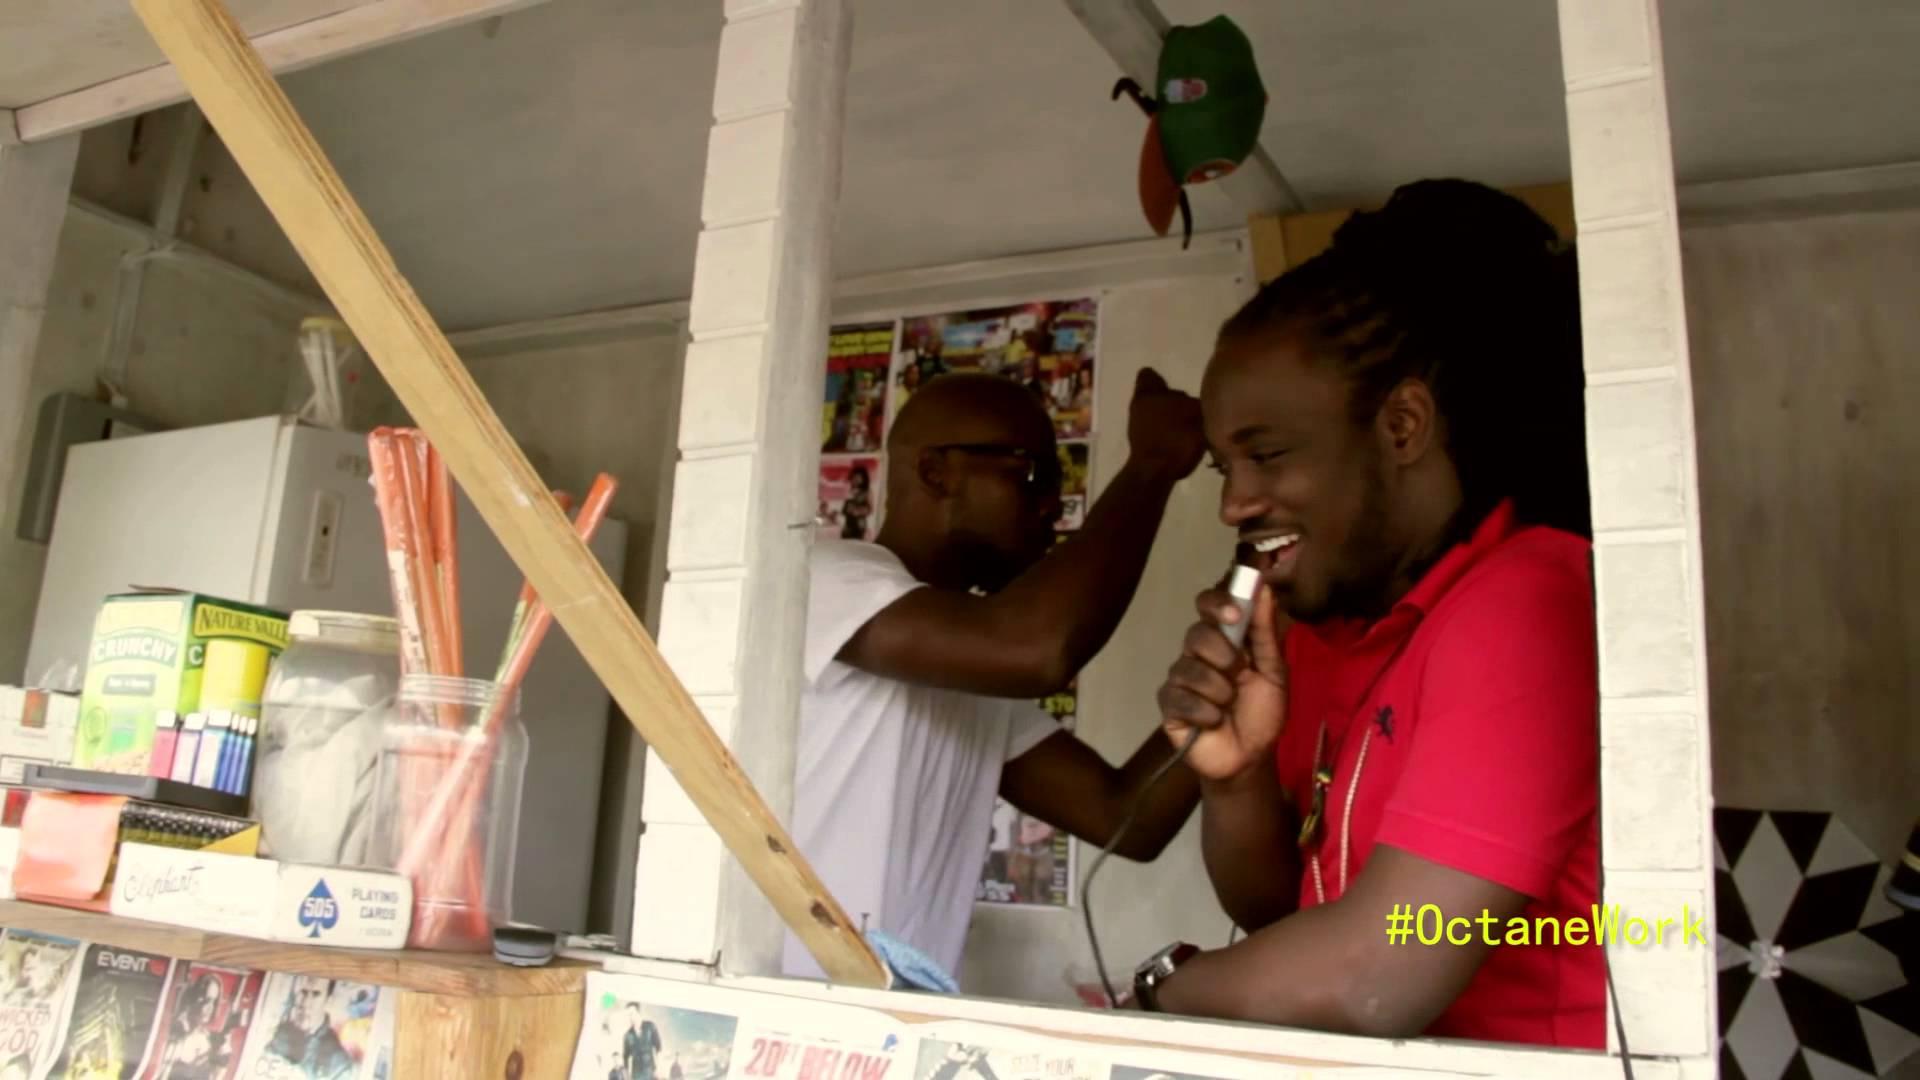 I Octane in Barbados [6/10/2014]